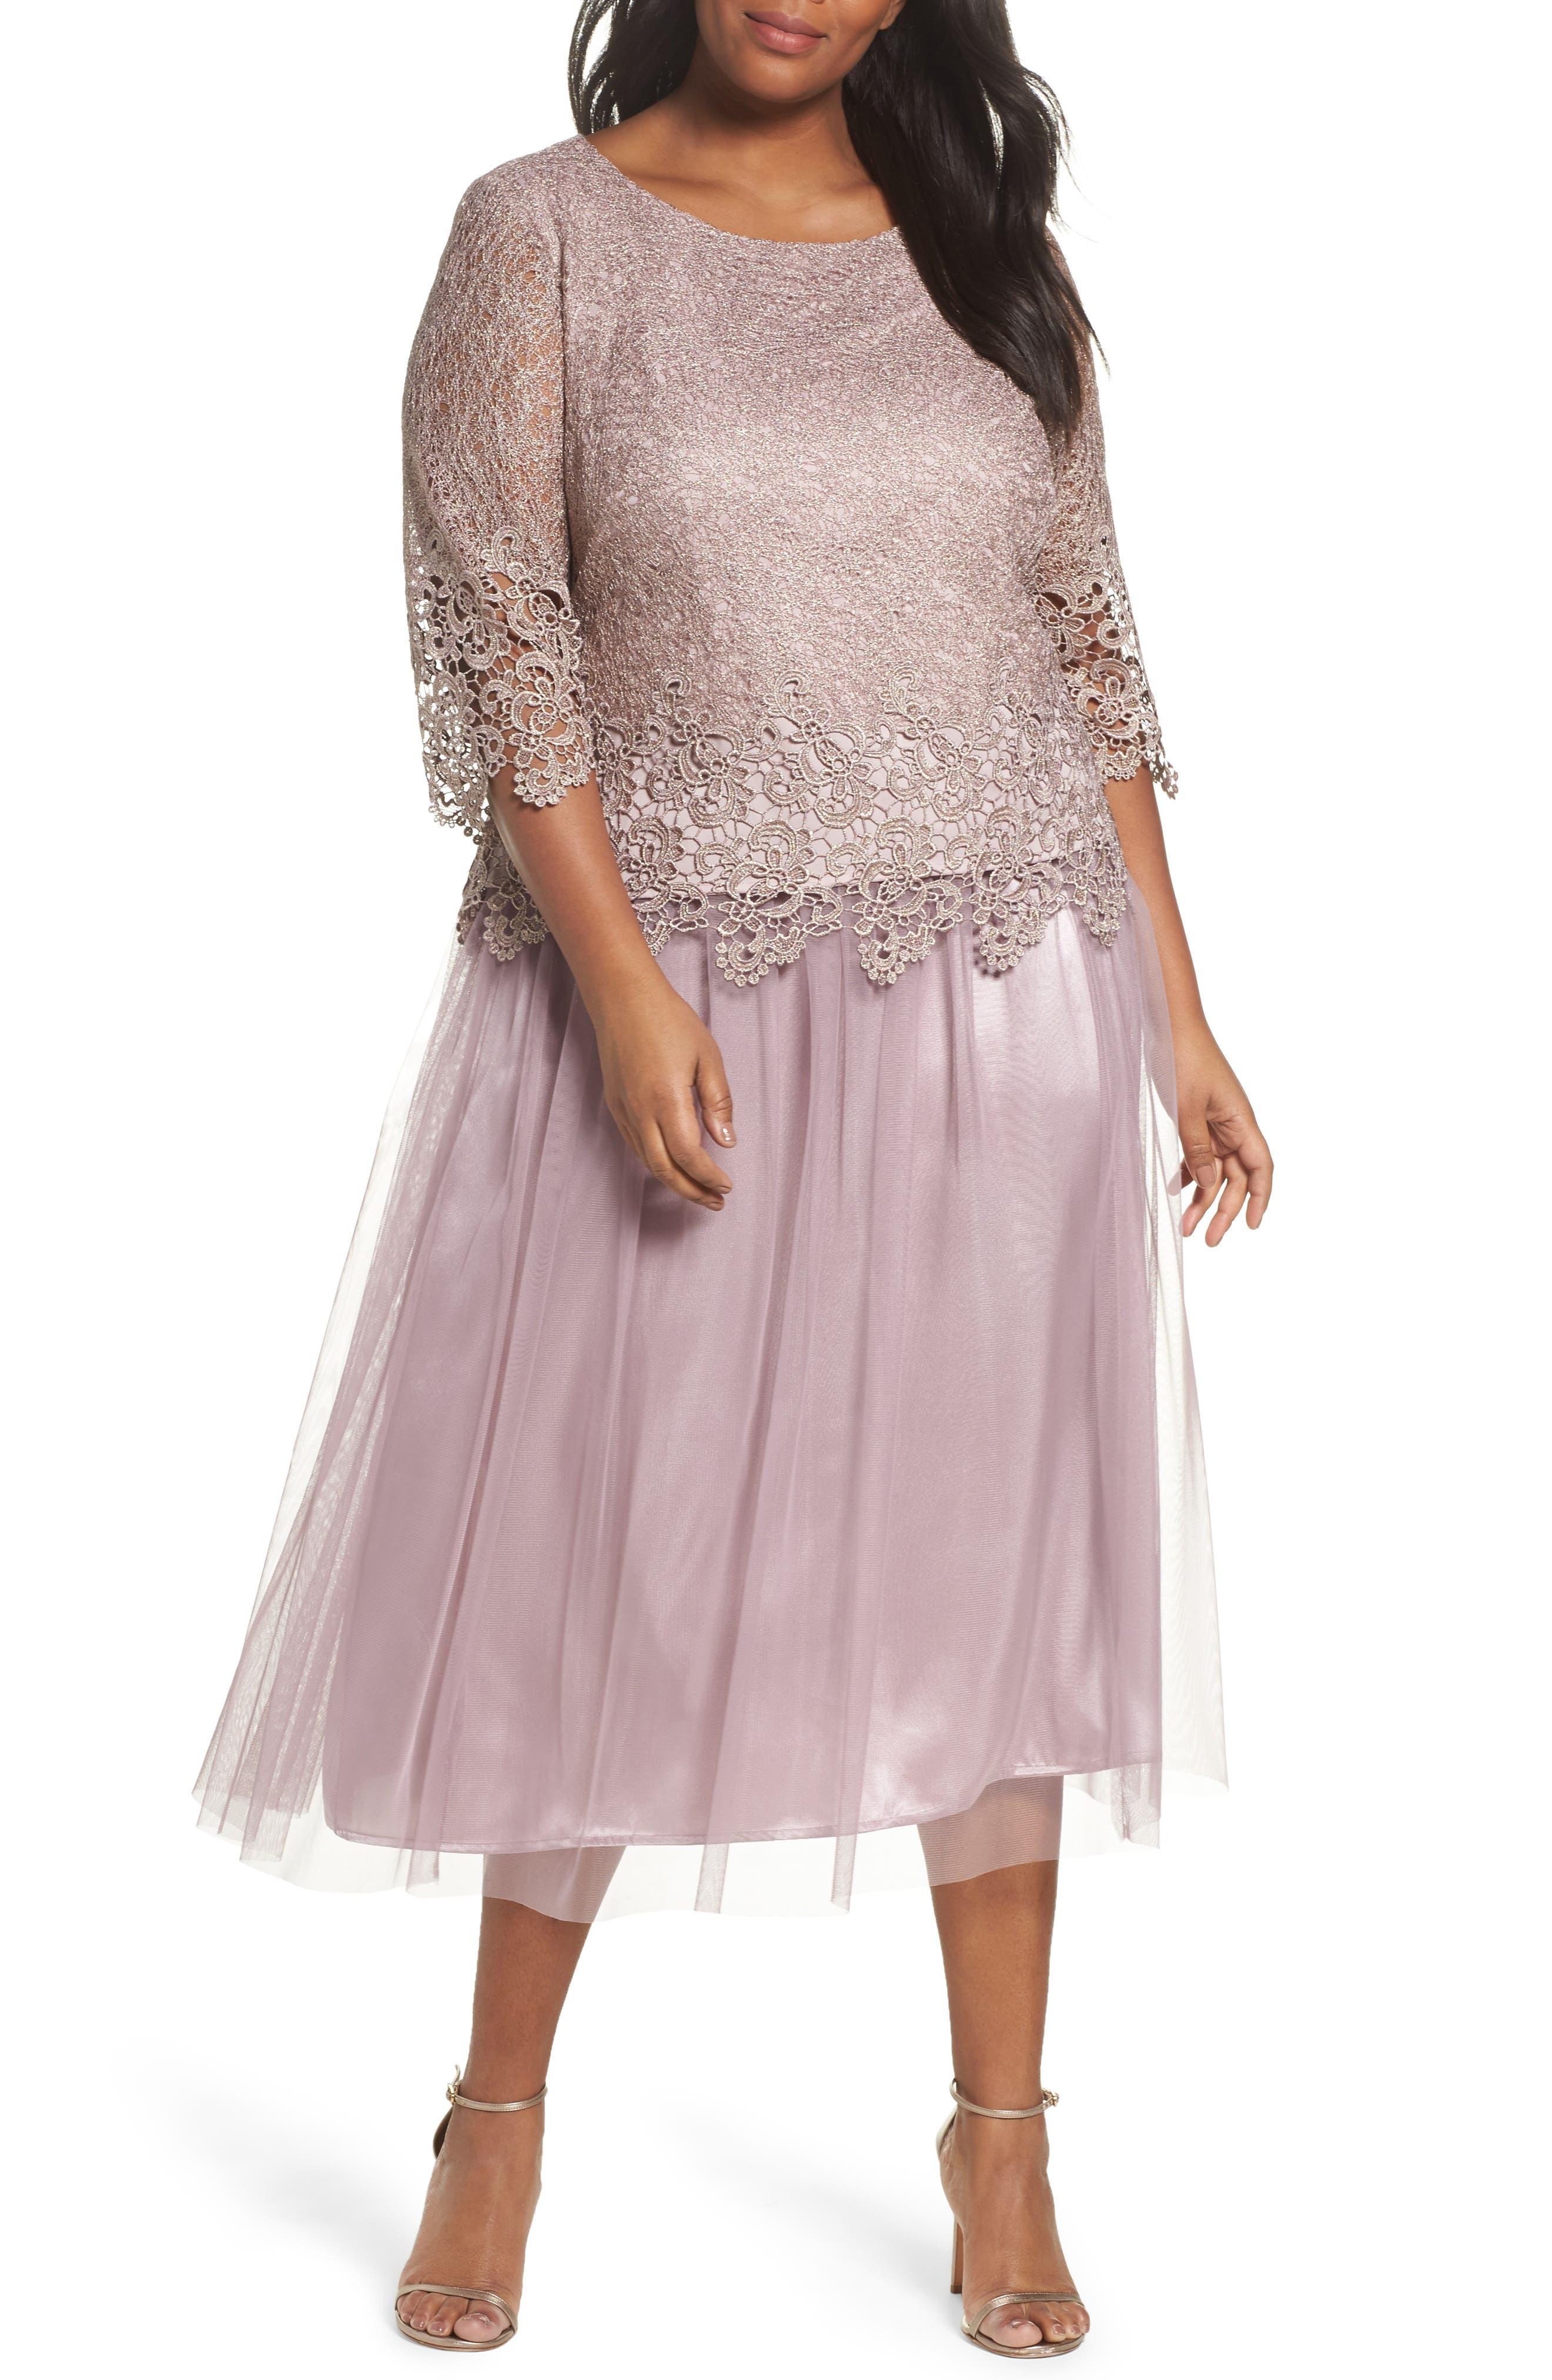 Embellished Mock Two-Piece Tea Length Dress,                             Main thumbnail 1, color,                             Rose